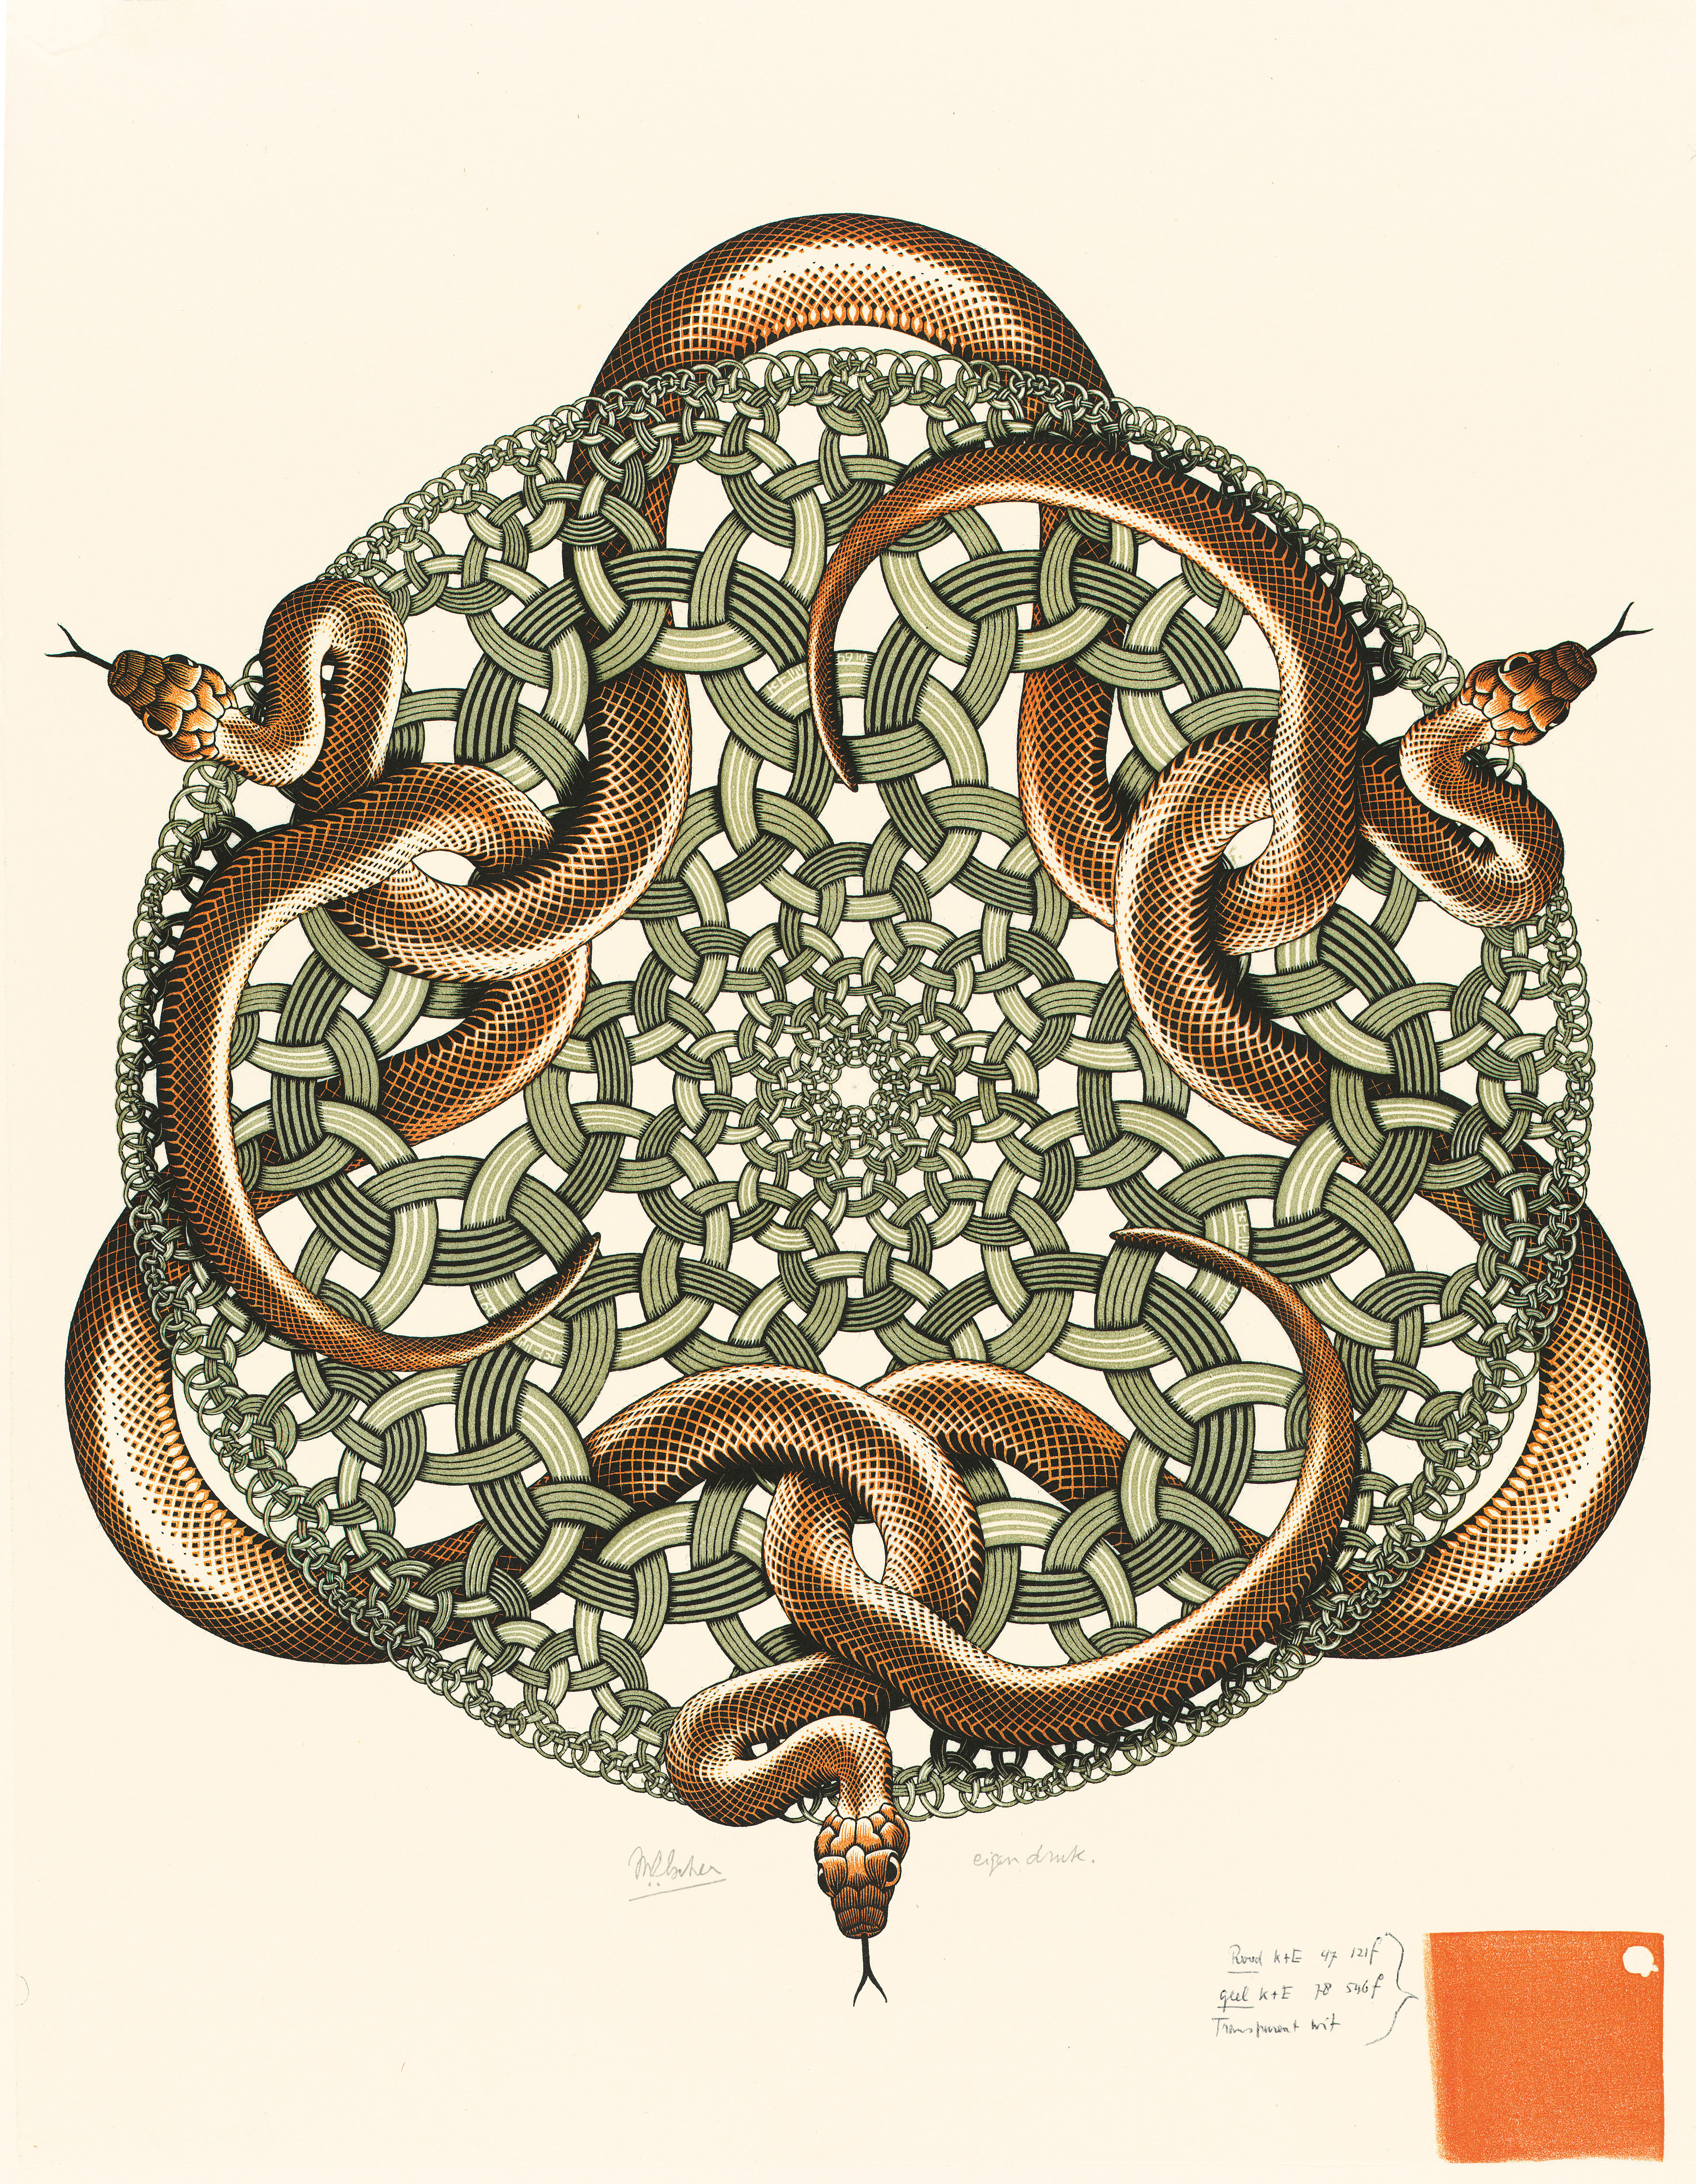 M. C. Escher Snakes July 1969 colour woodcut Escher Collection, Gemeentemuseum Den Haag, The Hague, the Netherlands © The M. C. Escher Company, the Netherlands. All rights reserved